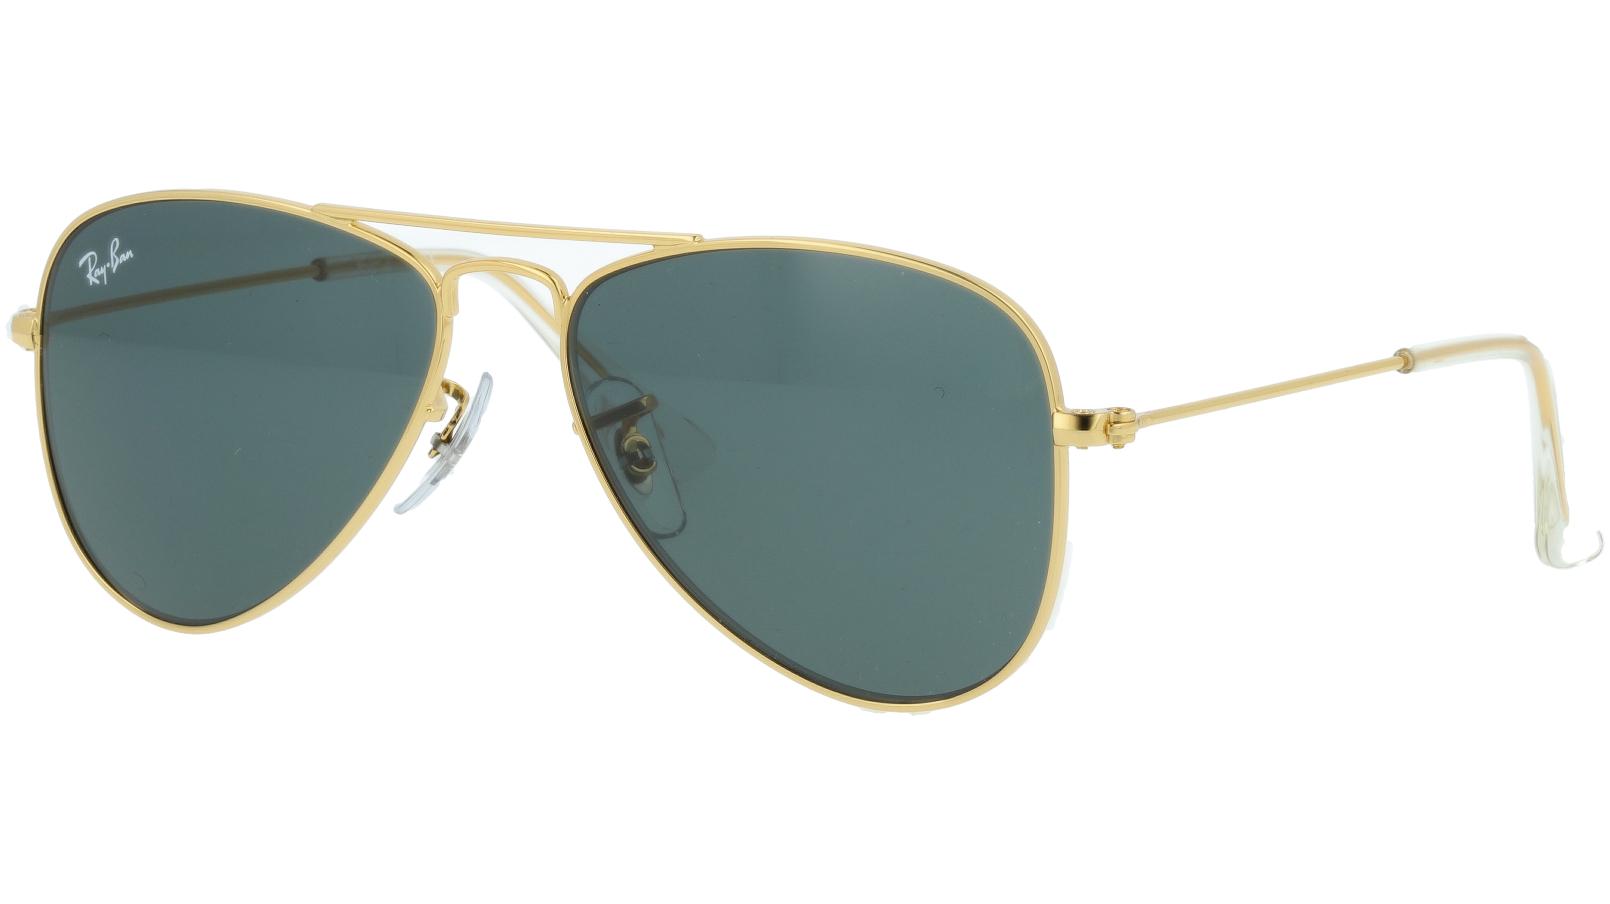 RAYBAN RJ9506S 223/71 50 GOLD Sunglasses